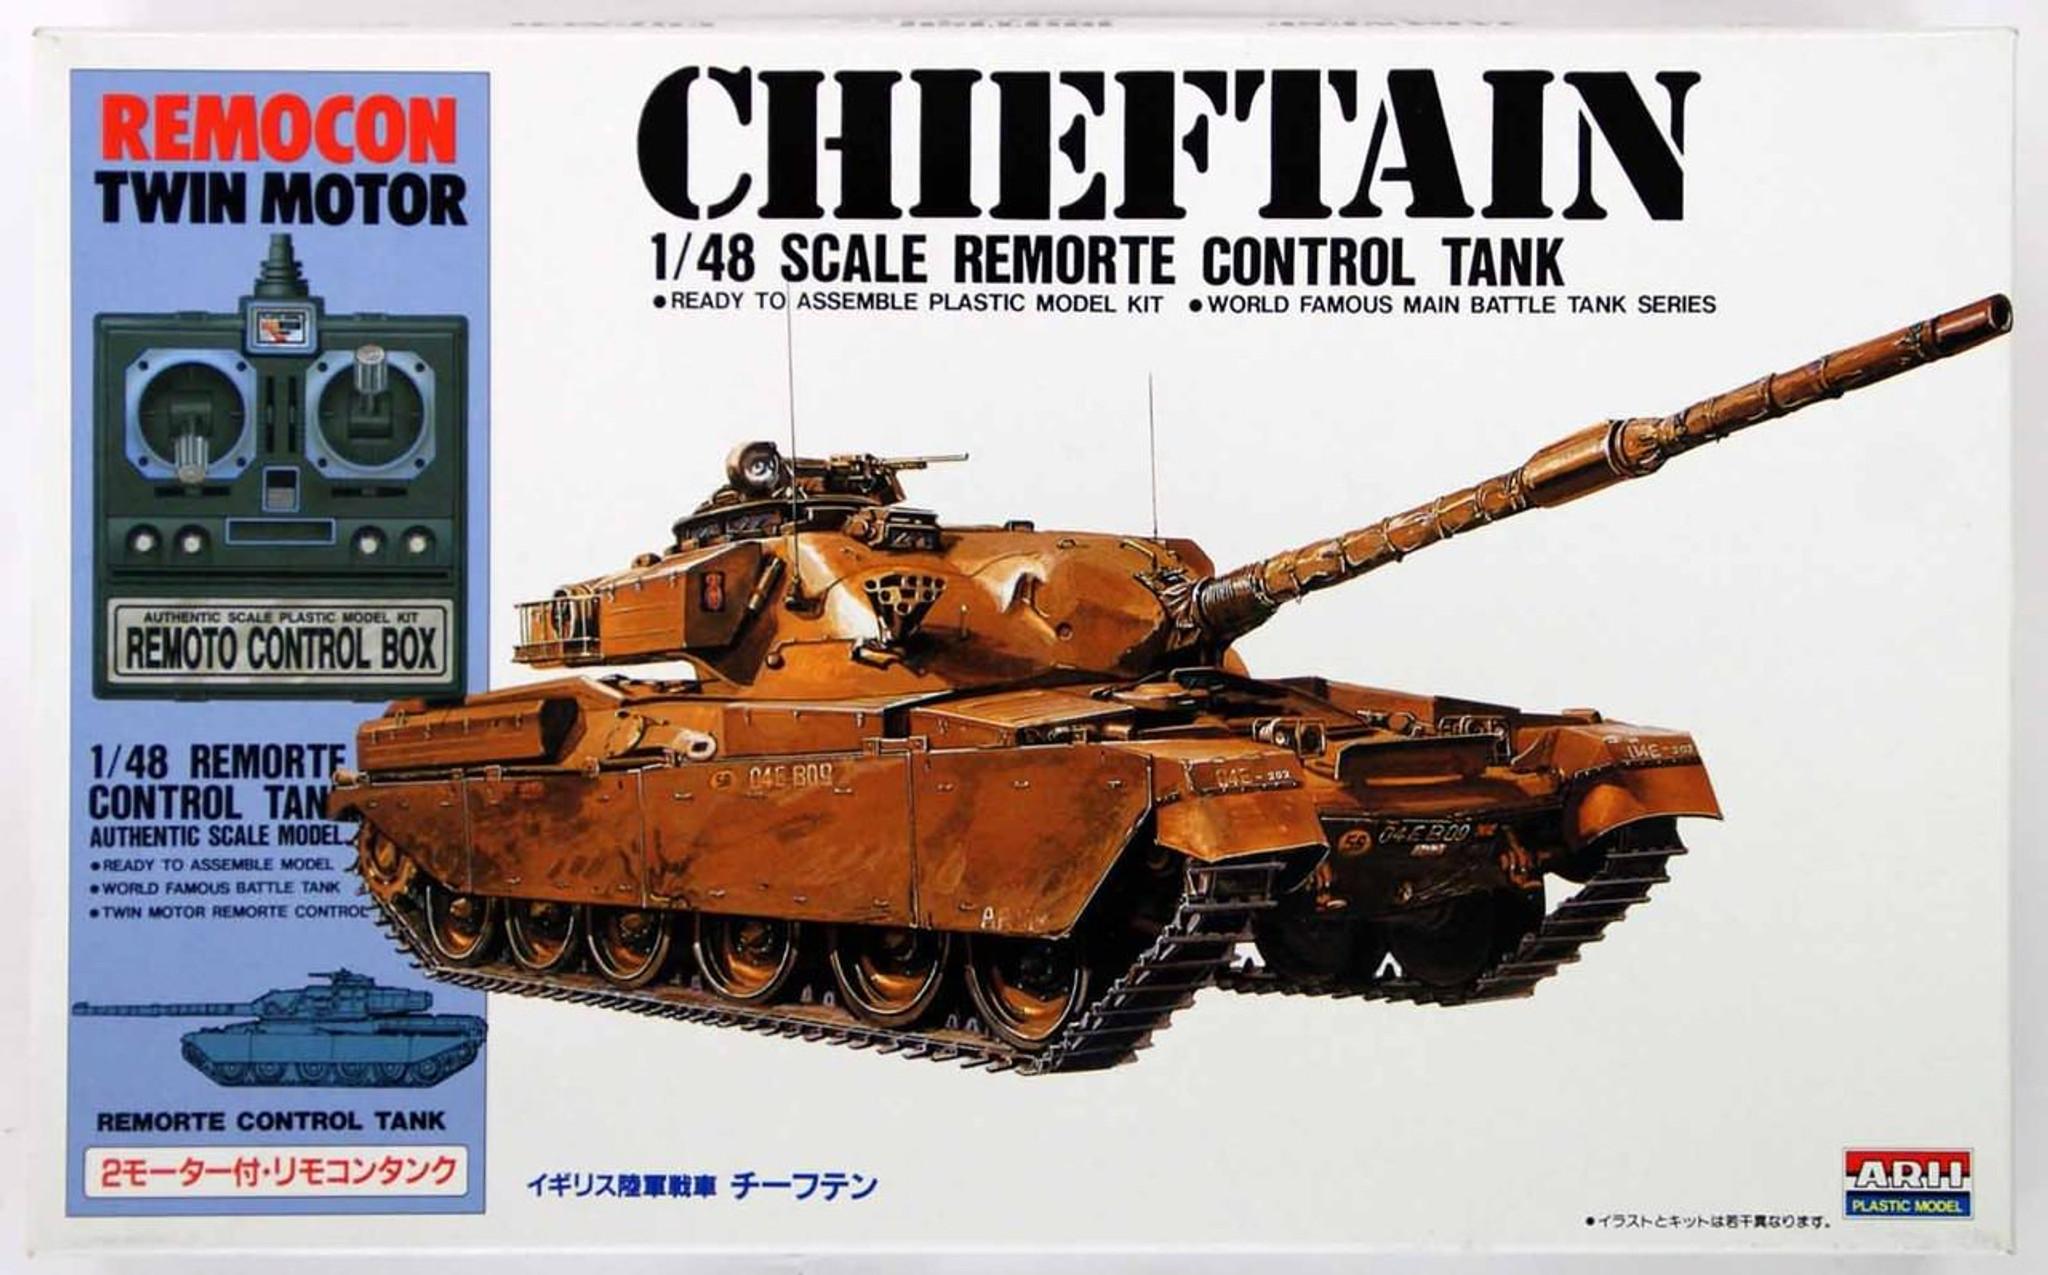 Arii 141533 Chieftain Remote Control Tank 1/48 Scale Kit